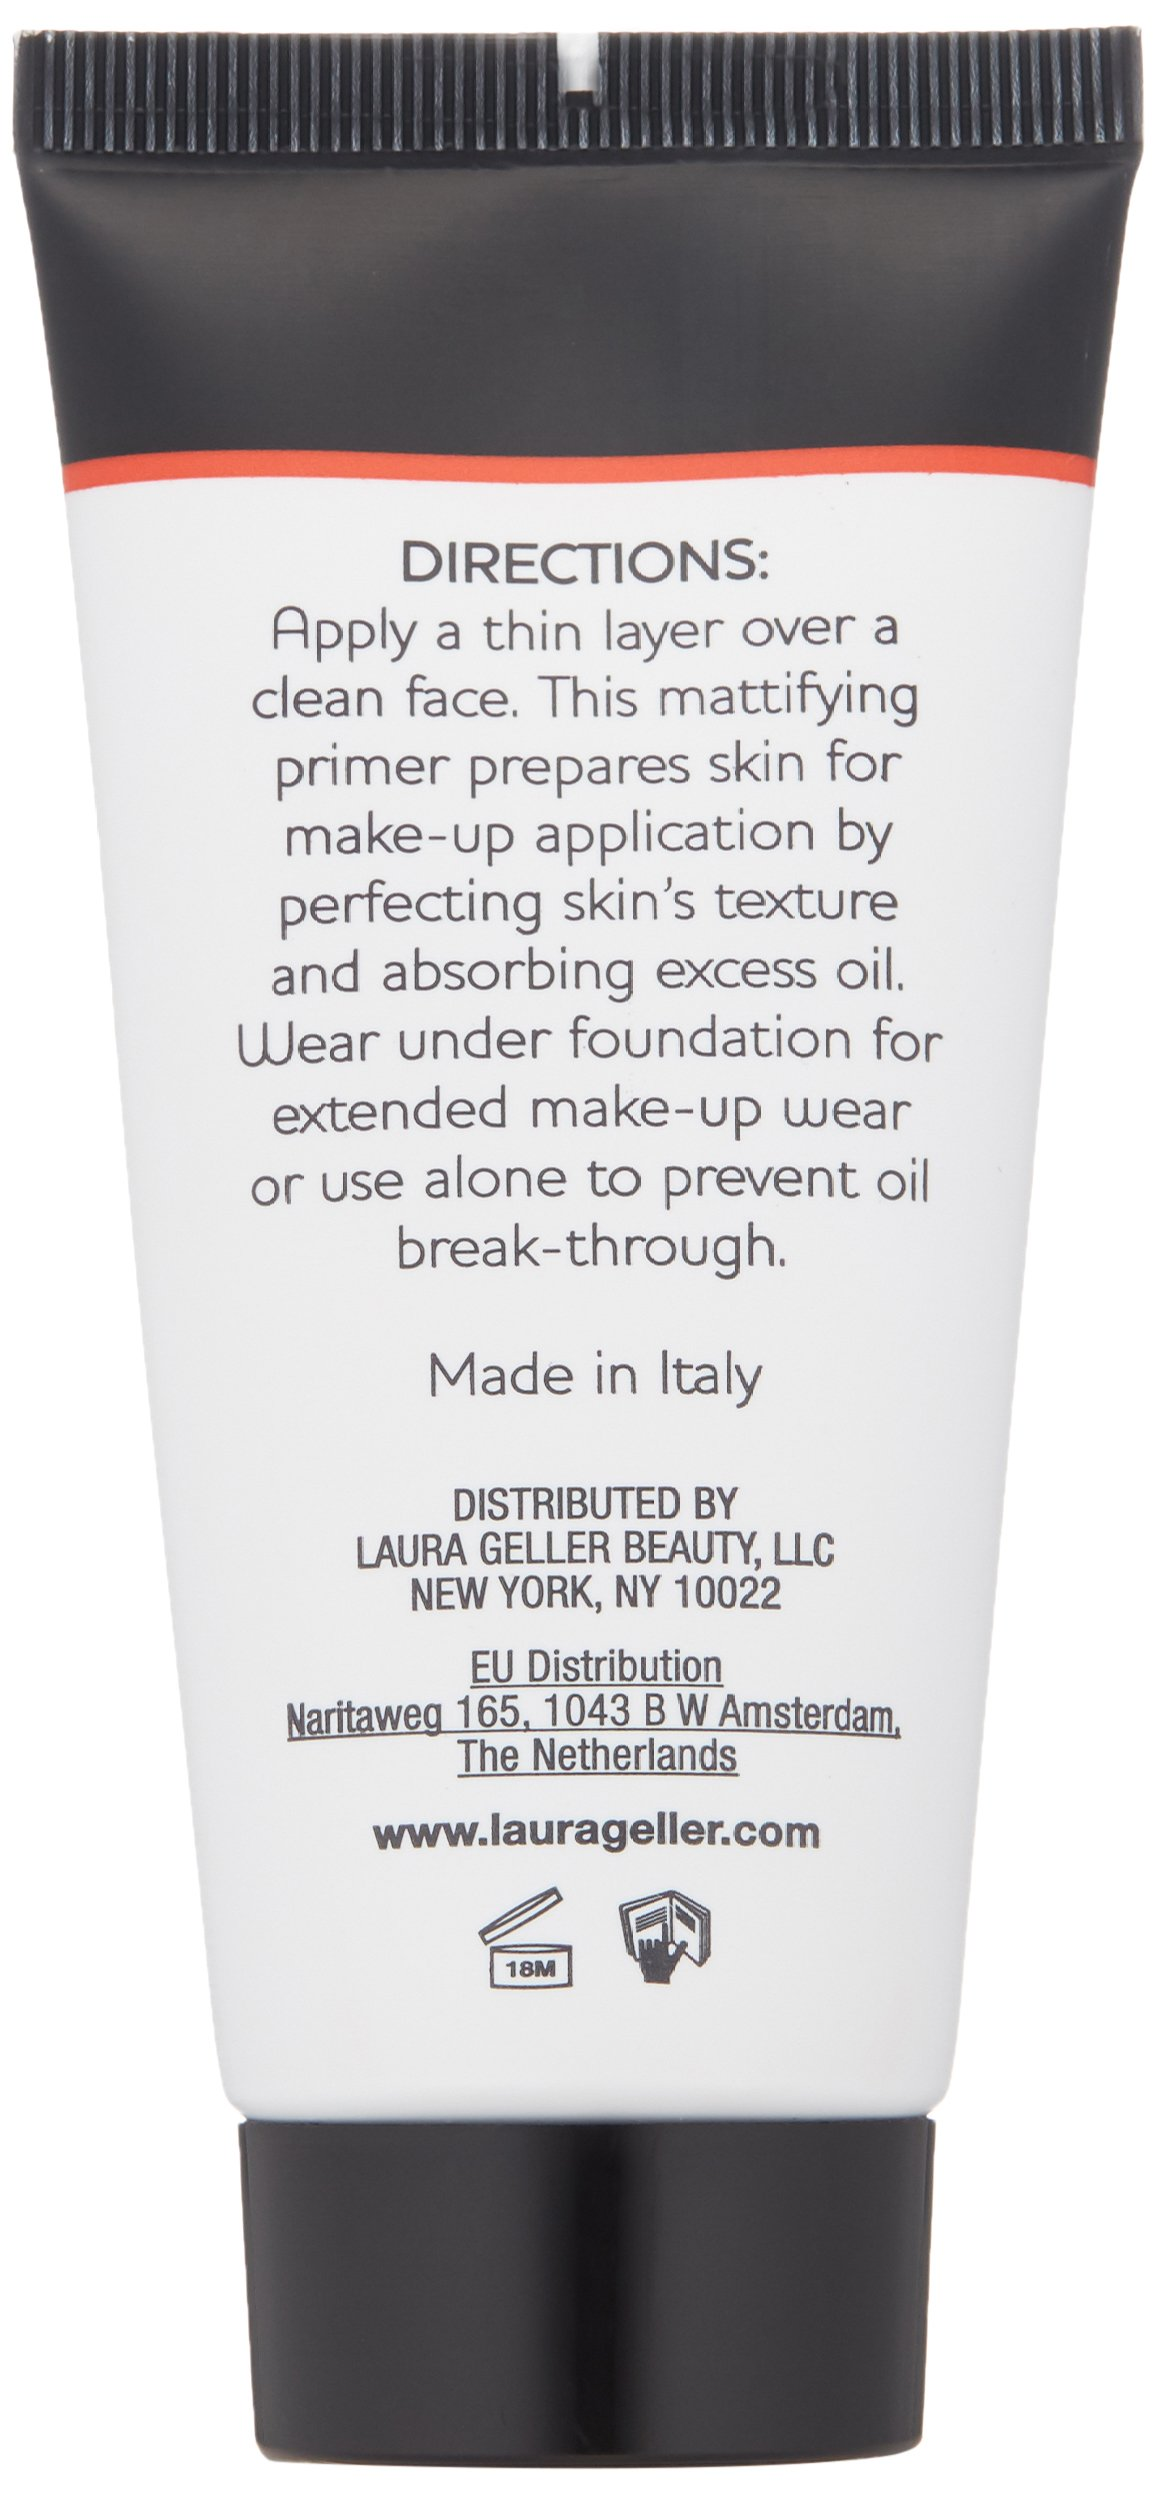 Laura Geller New York Spackle Mattifying Oil Control Under Make-up Primer, 2 fl oz. by LAURA GELLER NEW YORK